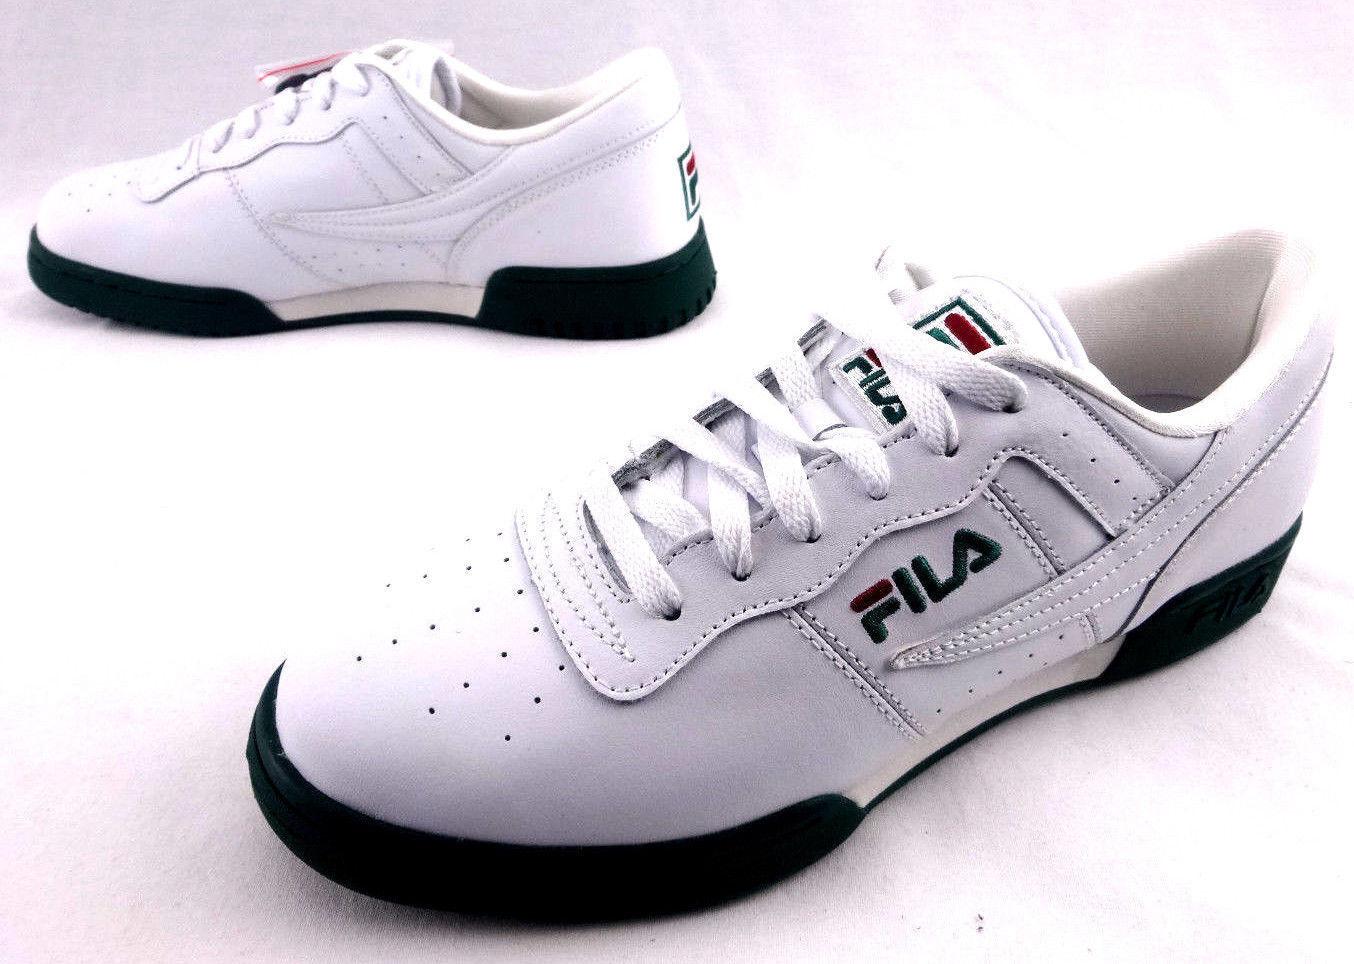 Fila Retro Heritage Original Fitness shoes 1VF80016-124 New USA Men's Size 8.5